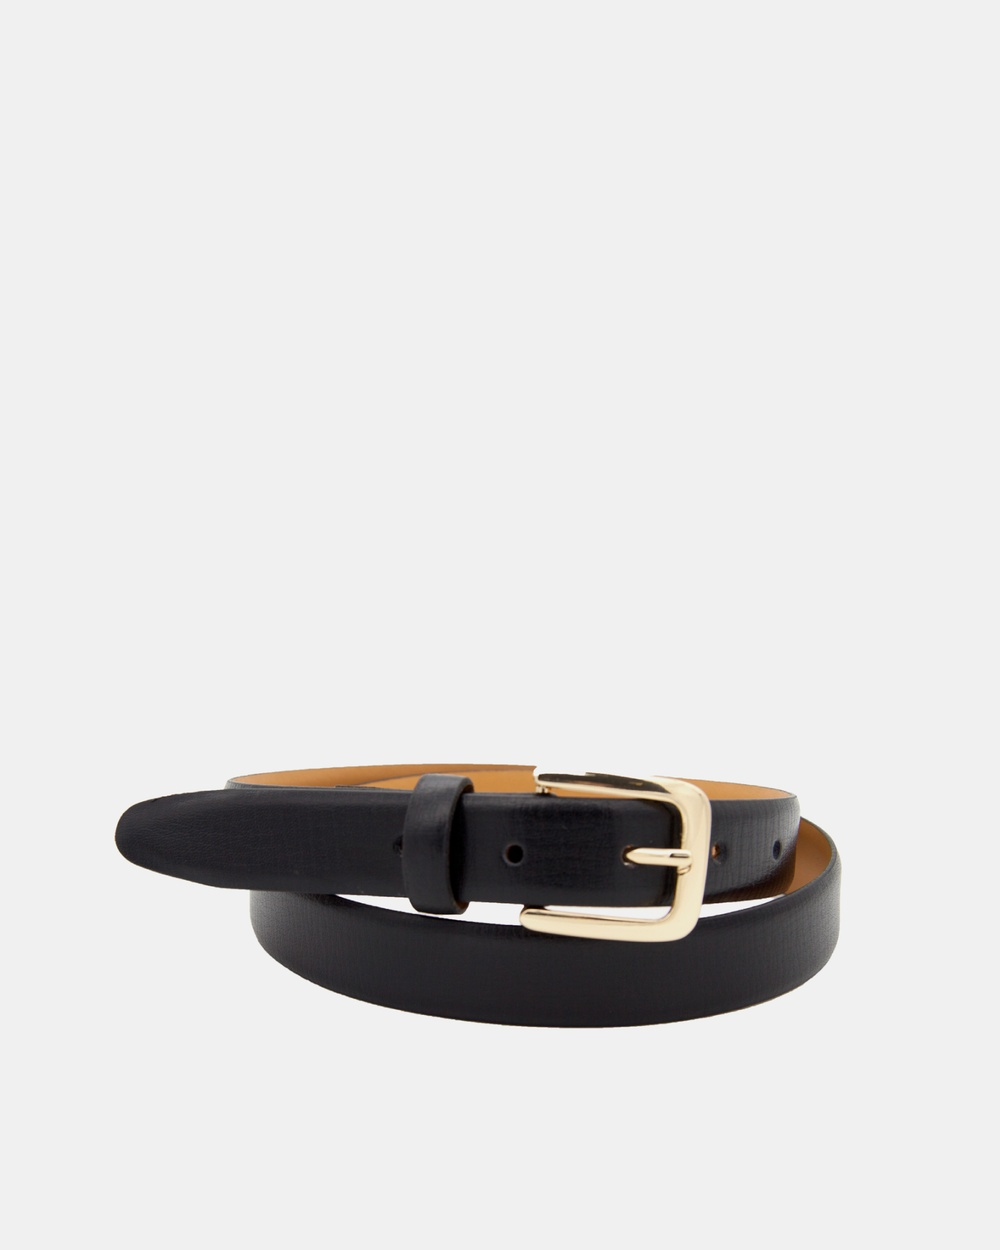 Loop Leather Co Bliss Belts Black